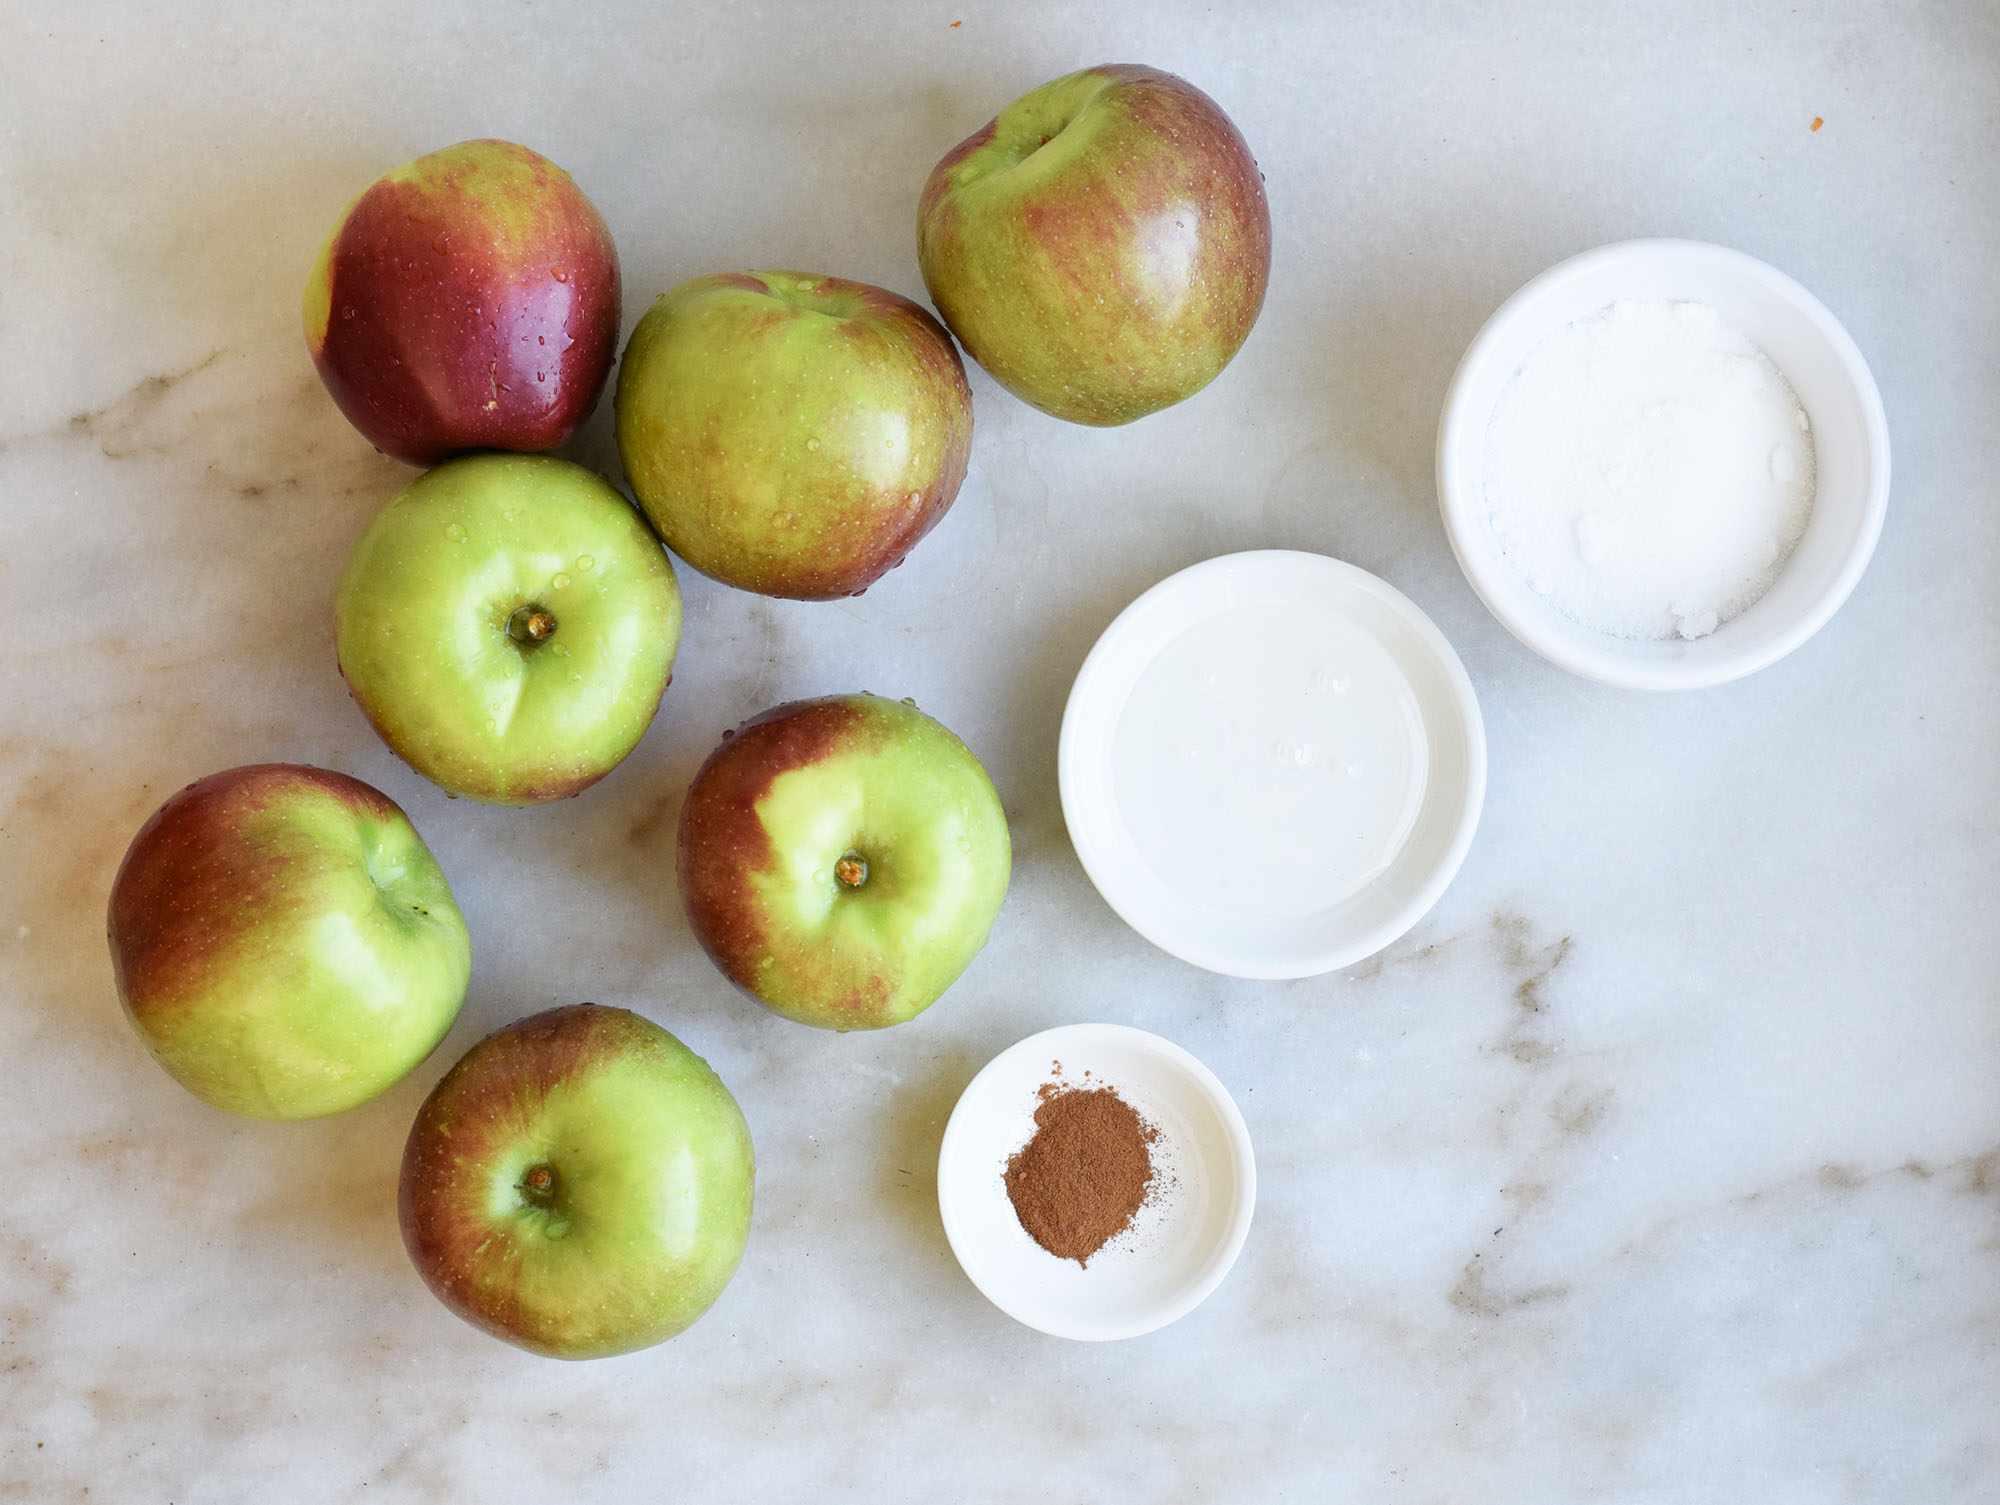 apple chips ingredients